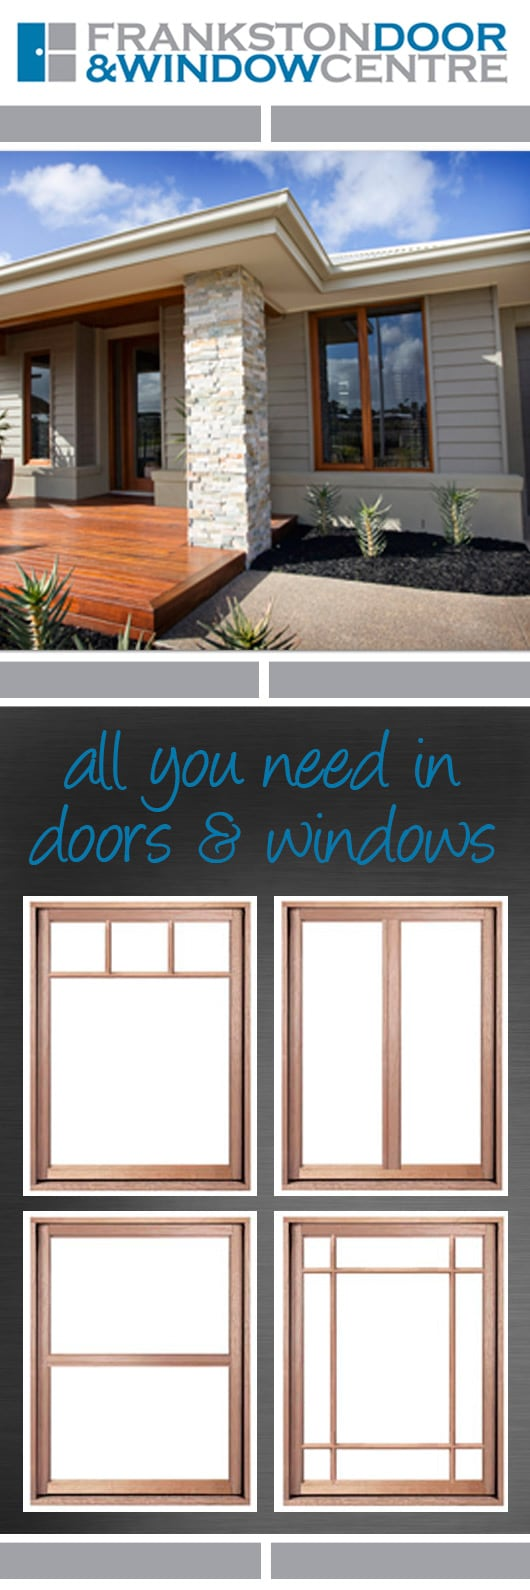 Frankston Door & Window Centre - Promotion